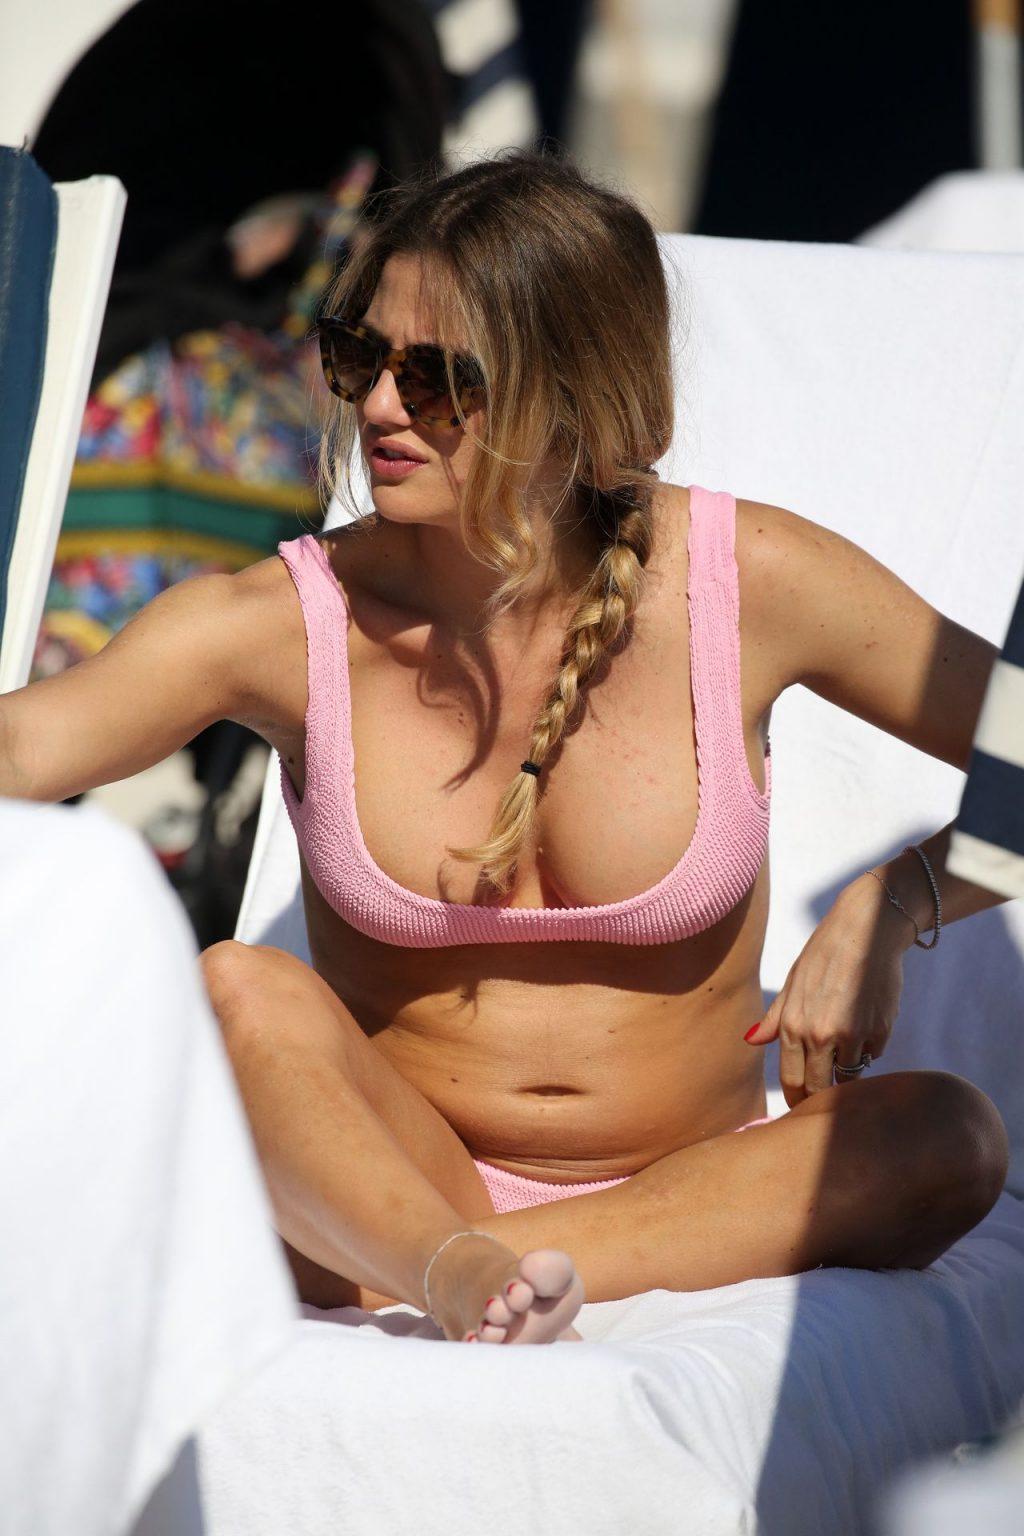 Cristina Marino Shows Off Her New Curves in a Bikini (76 Photos)